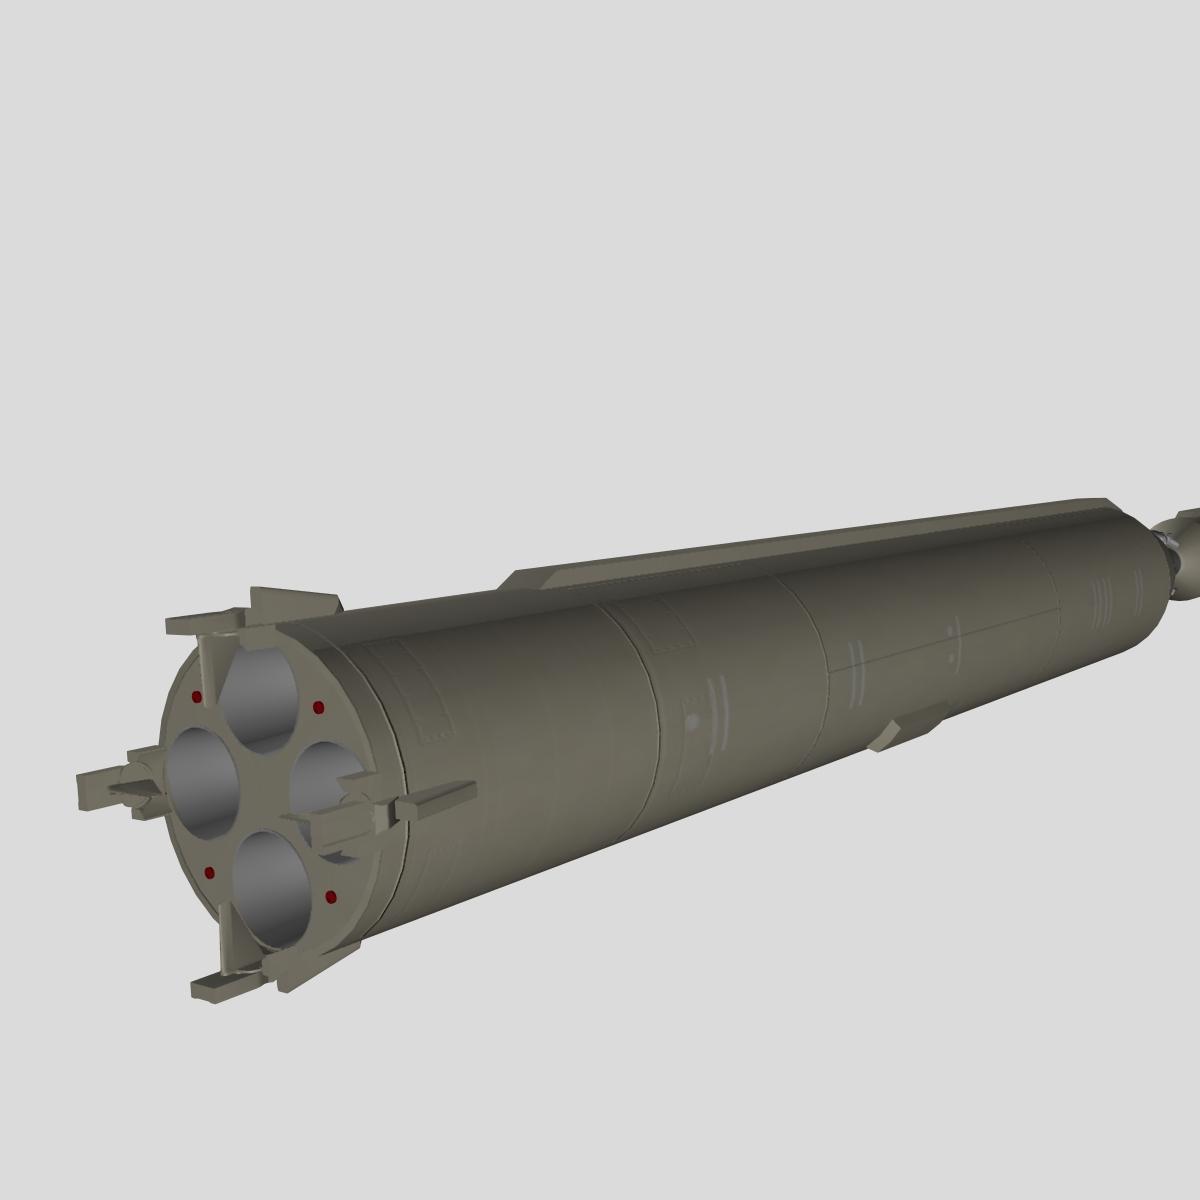 iranian simorgh missile concept 1 3d model 3ds dxf cob x obj 158267